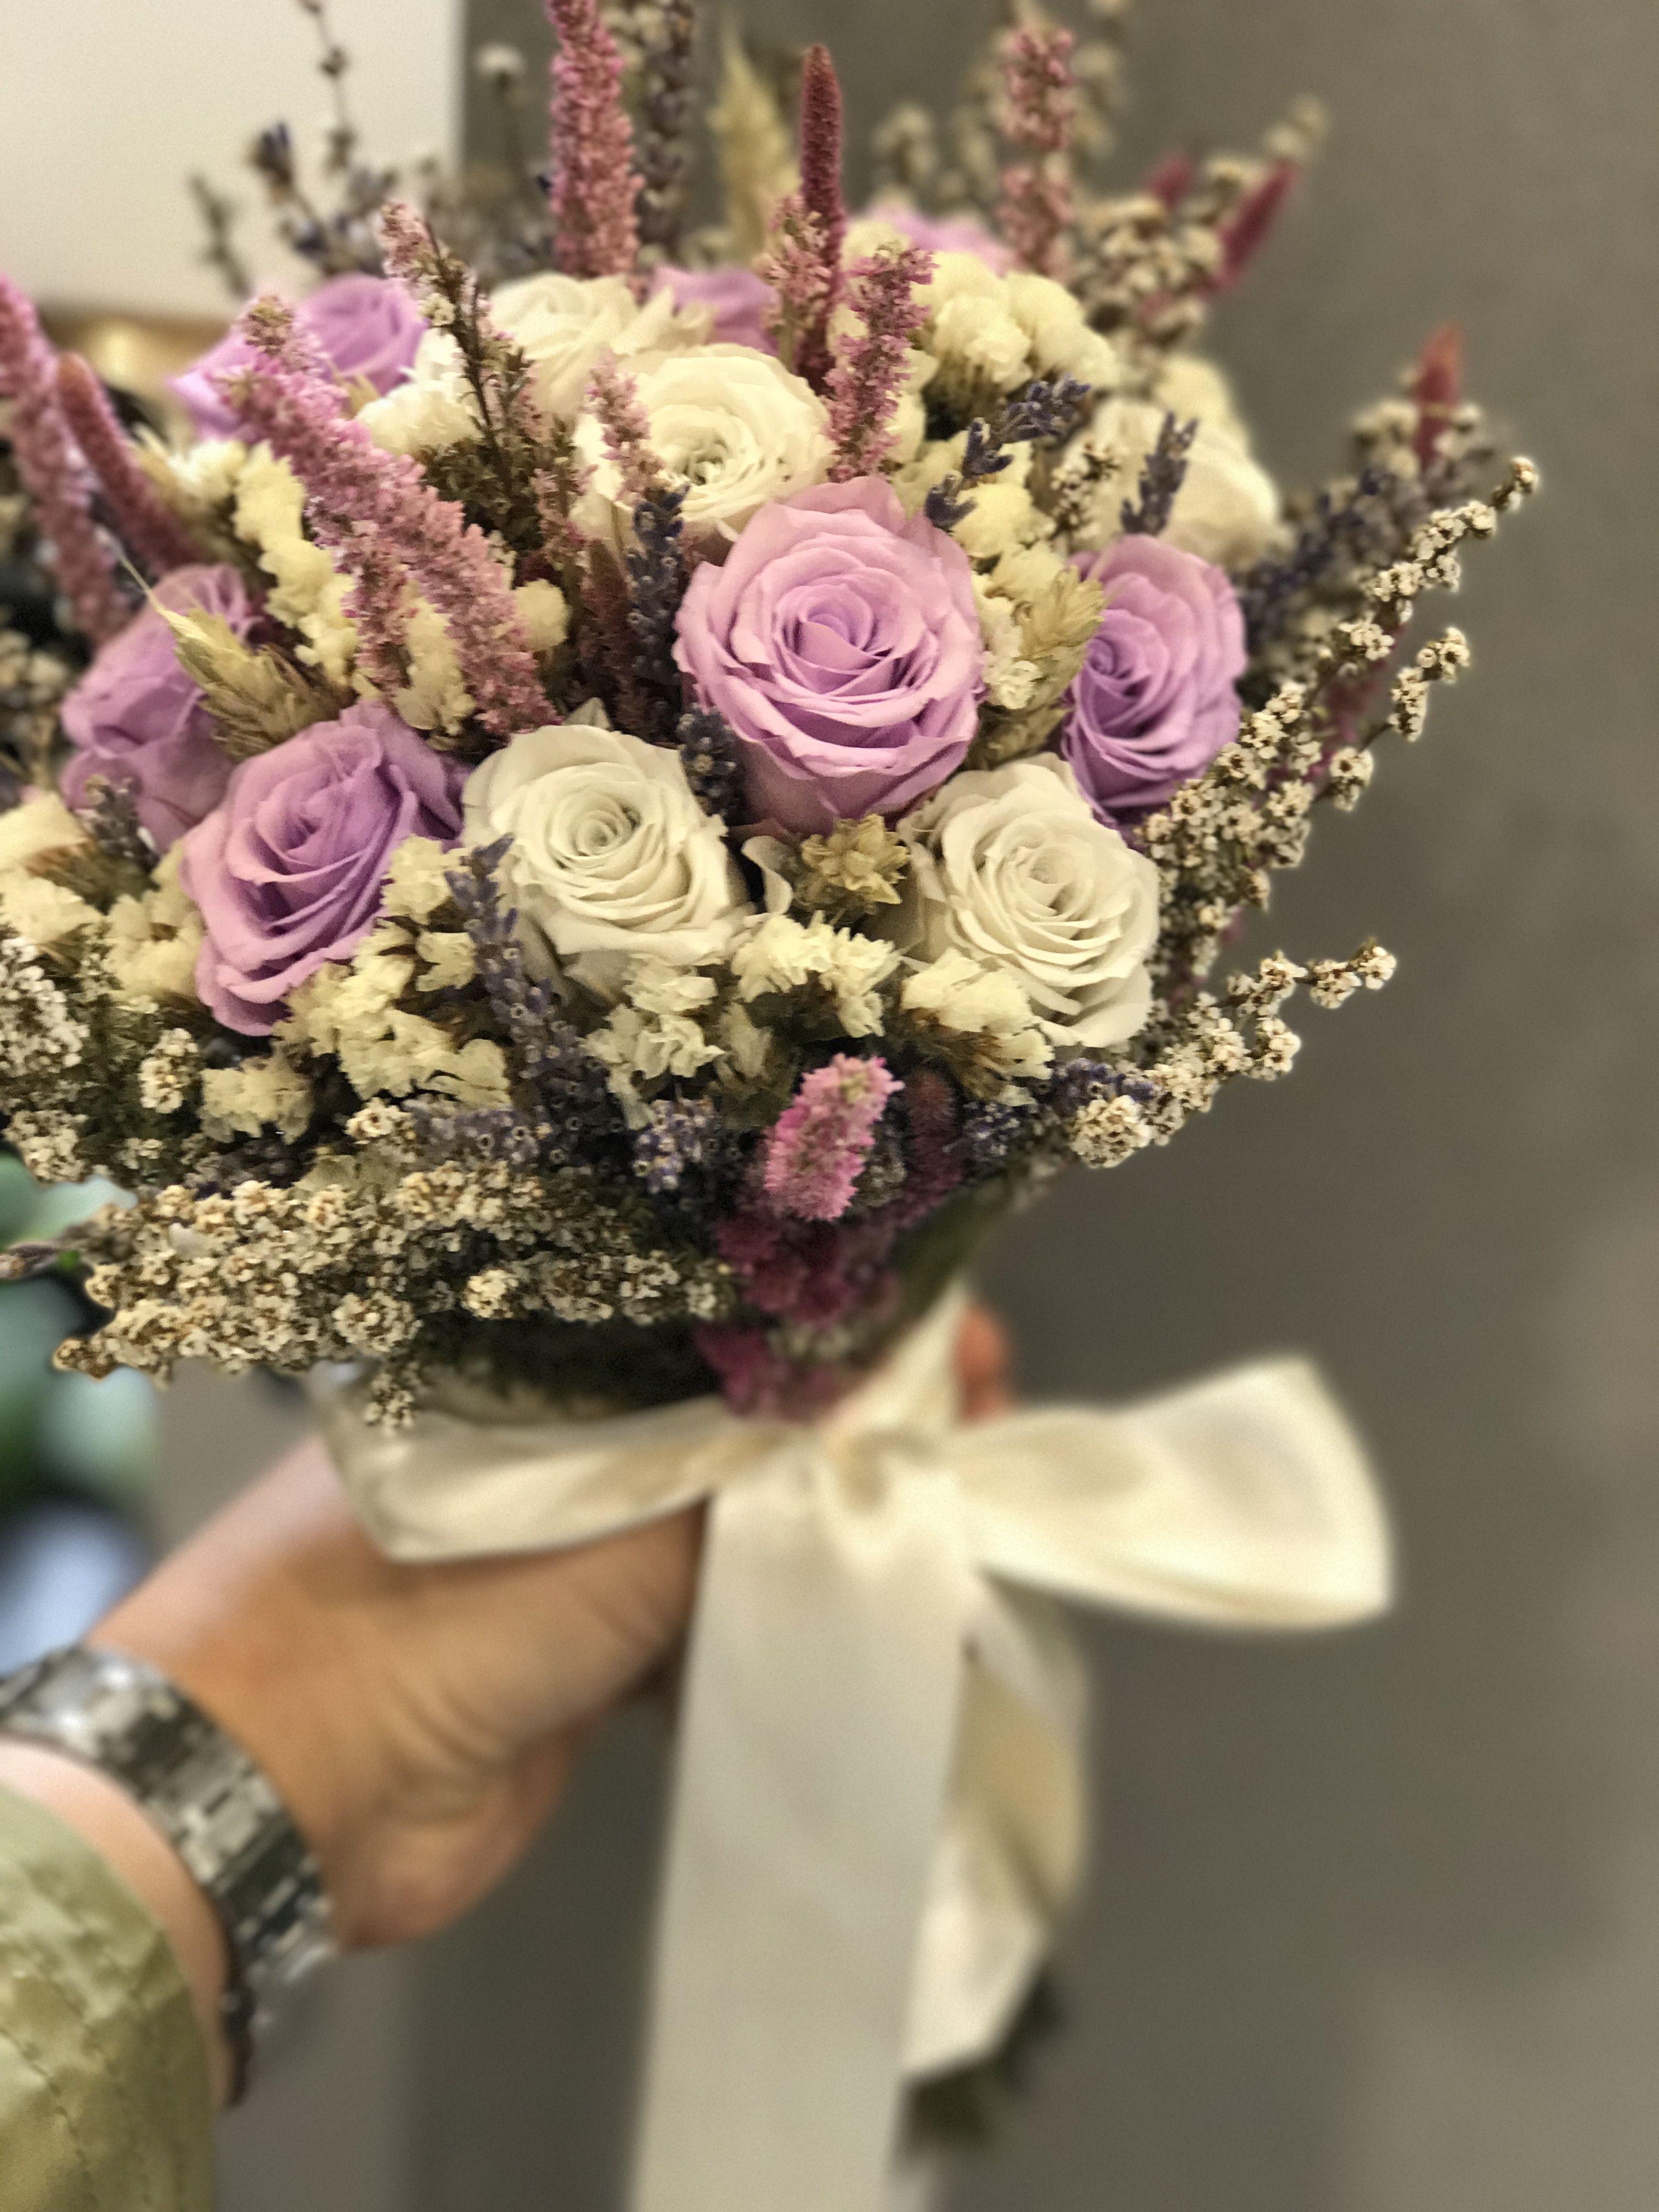 Dried Flowers Bridal Bouquets Kurutulmus Gelin Buketi Bouquets